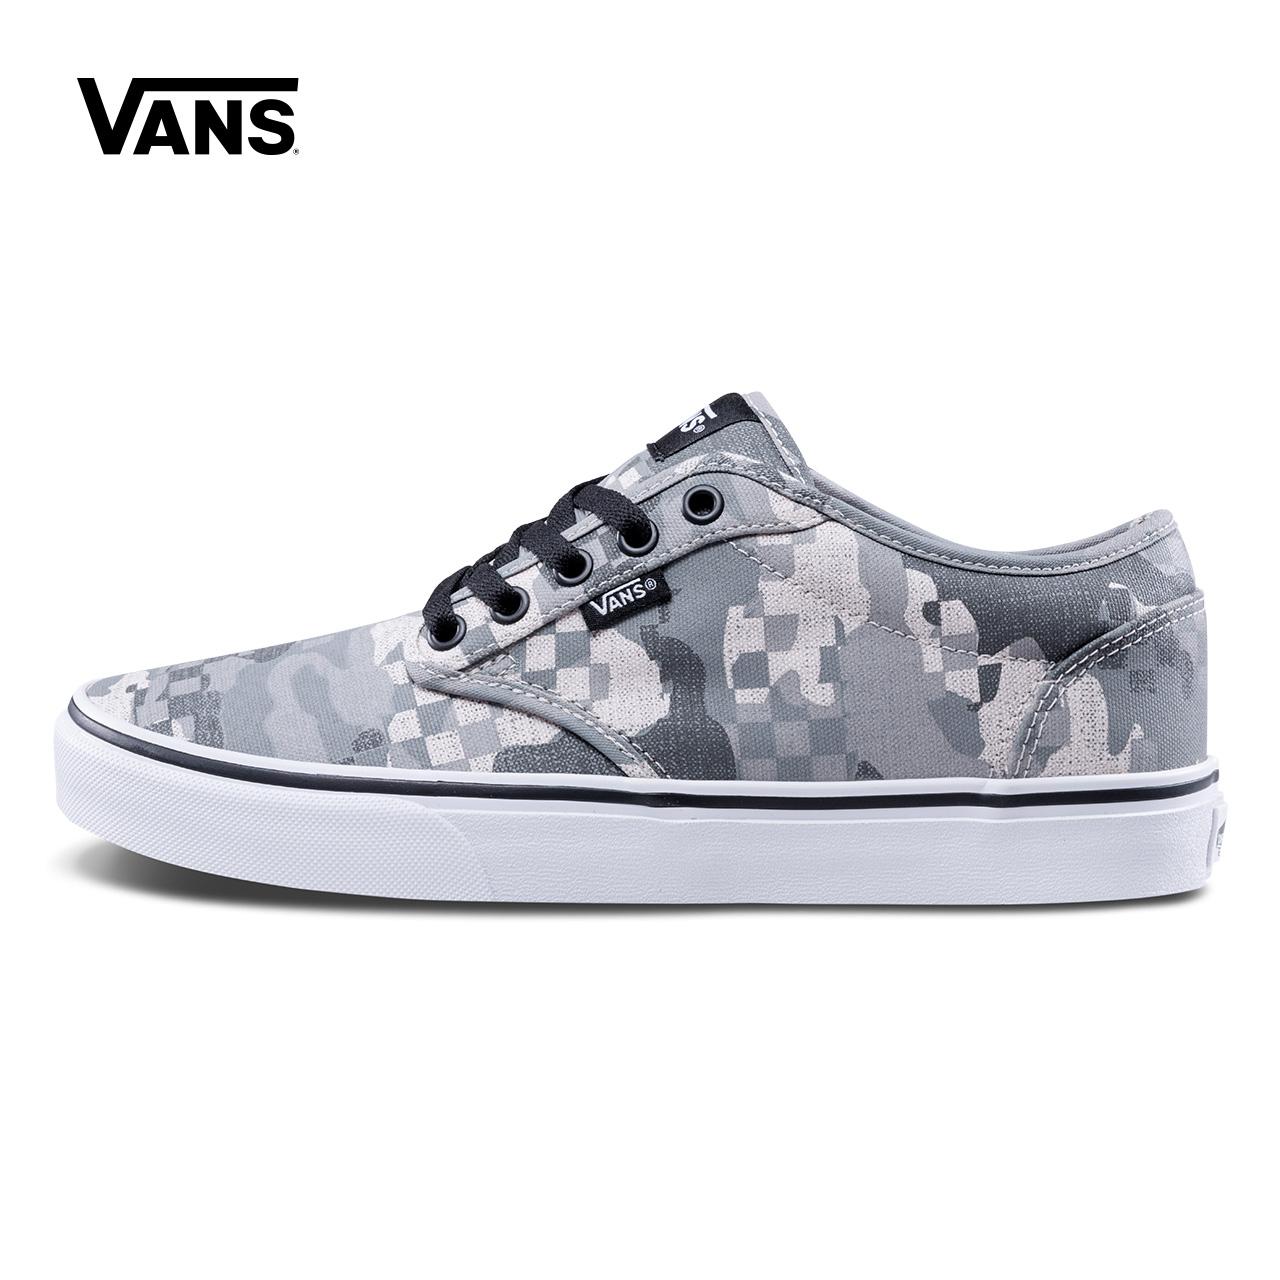 Vans/范斯男款运动鞋板鞋帆布鞋|VN0A327LOMJ